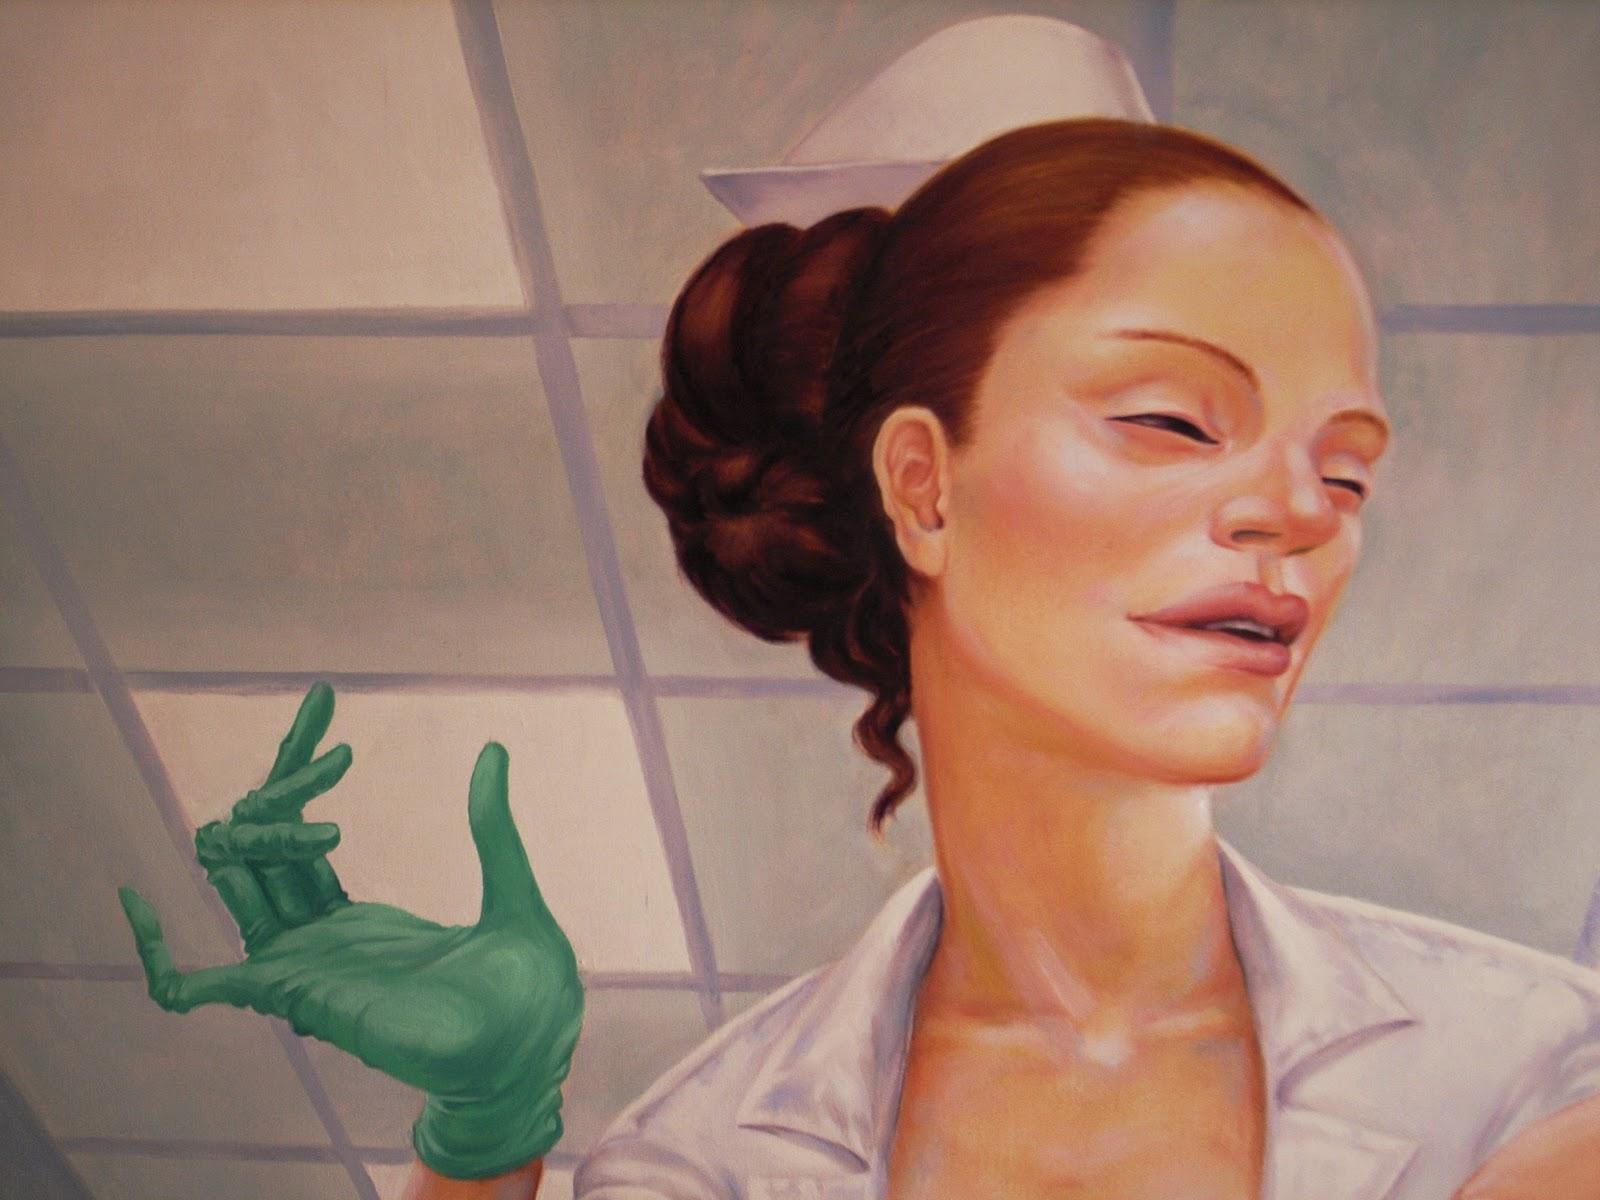 armando-prieto-perez-autoritratto-retroattivo-pediatra-dipinto-olio-tela